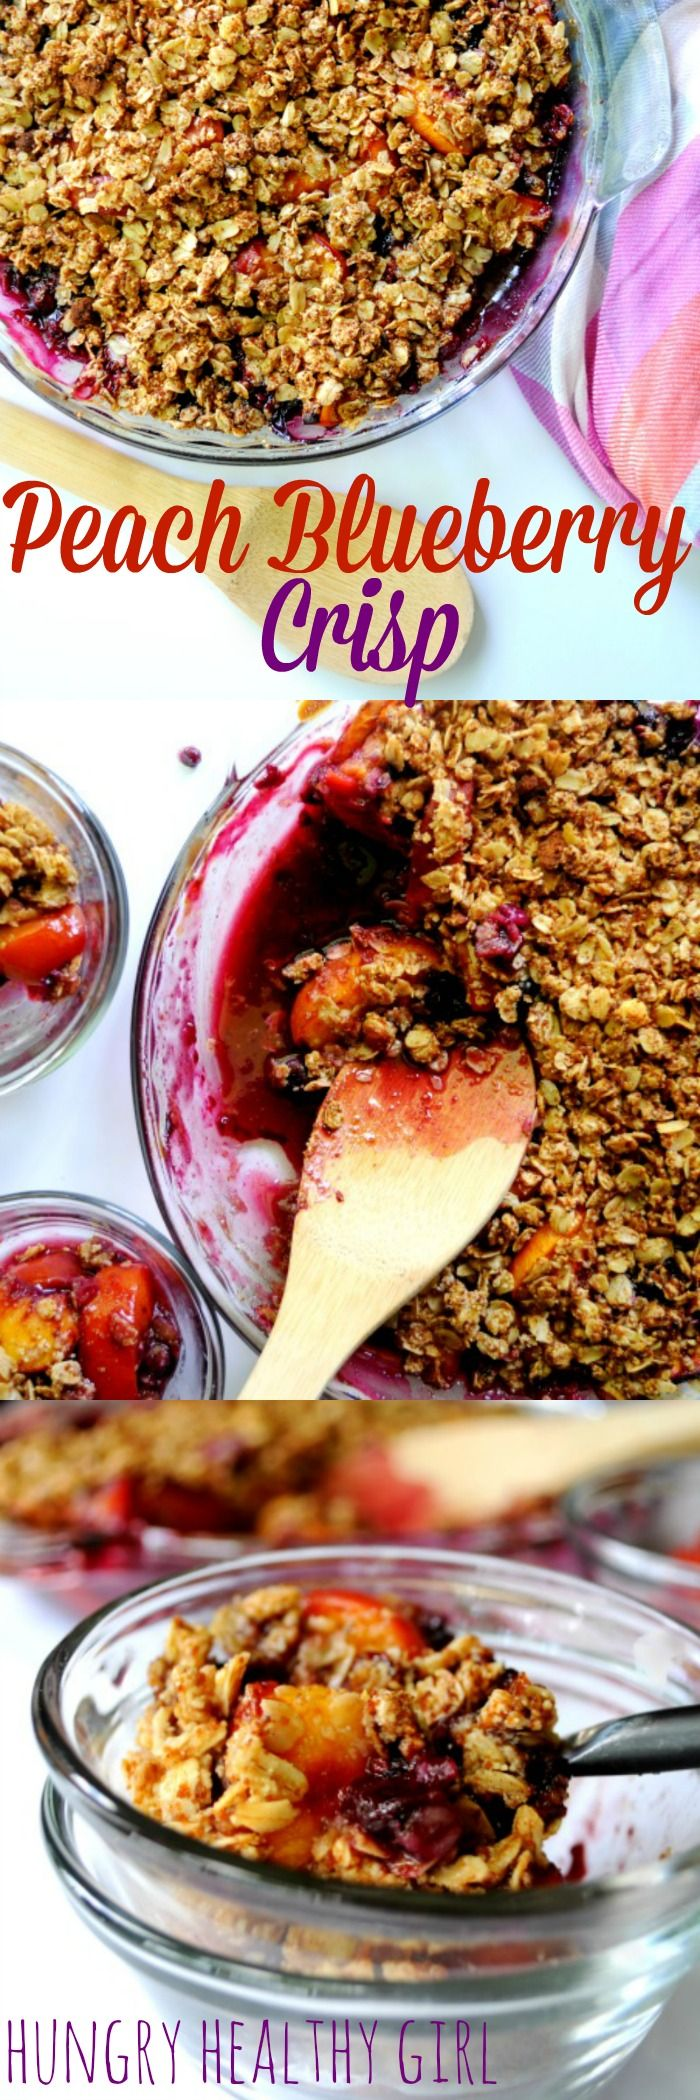 Easy Peach Blueberry Crisp #vegan #glutenfree #allnatural